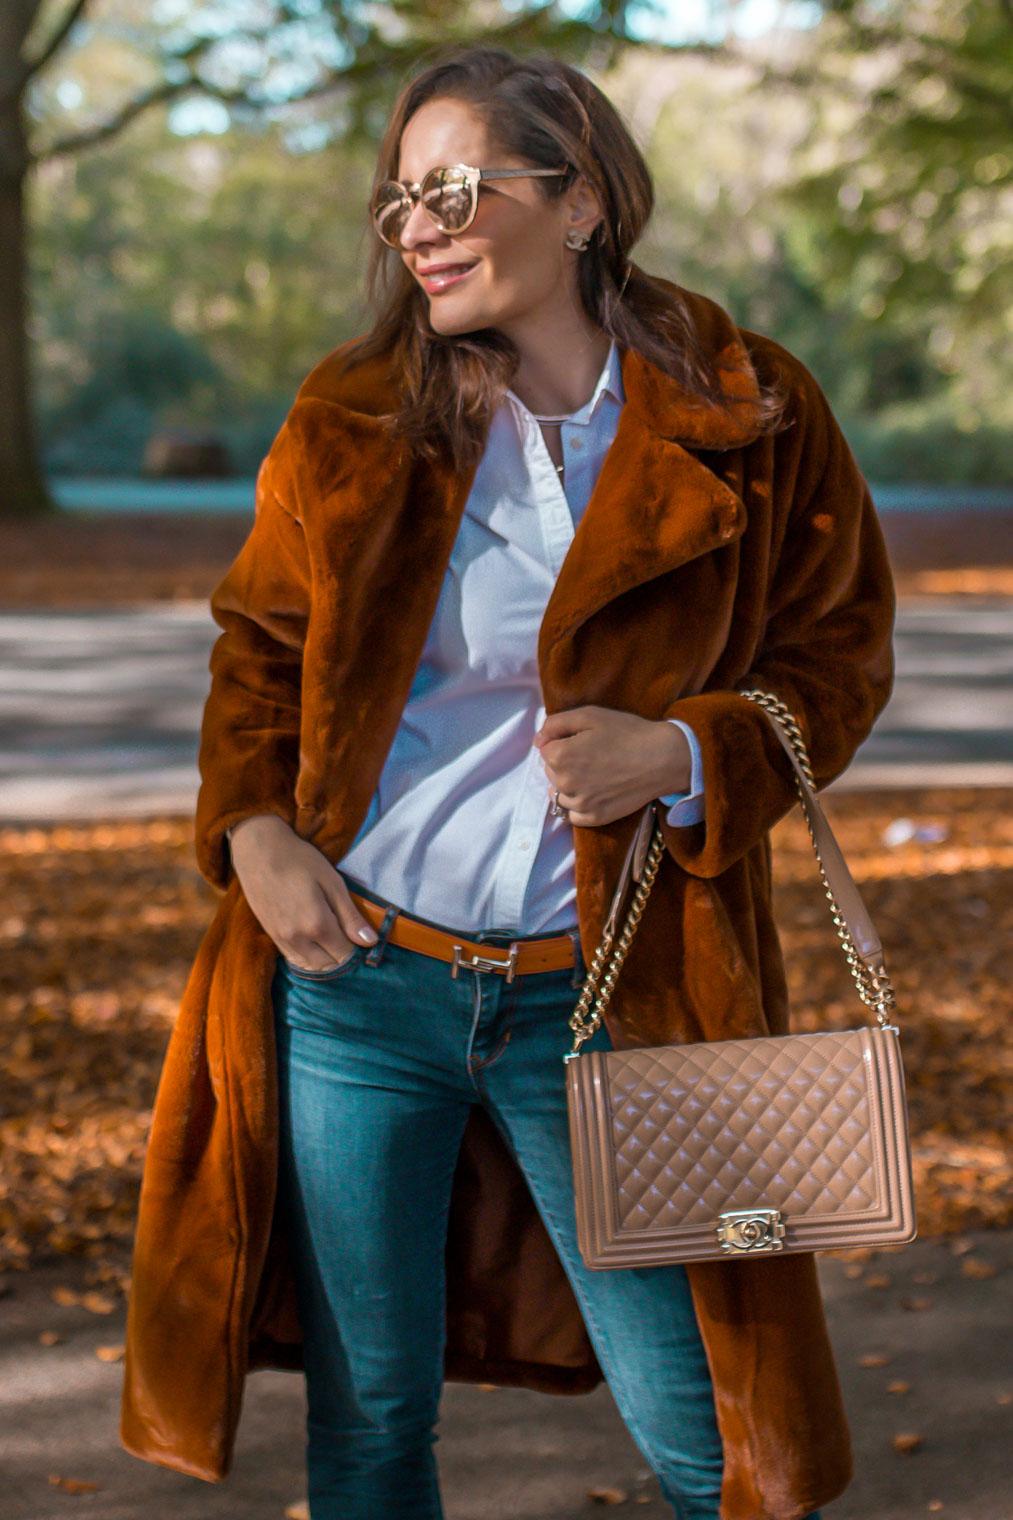 Faux fur coat Chanel boy bag Tods orange belt Linda Farrow sunglasses